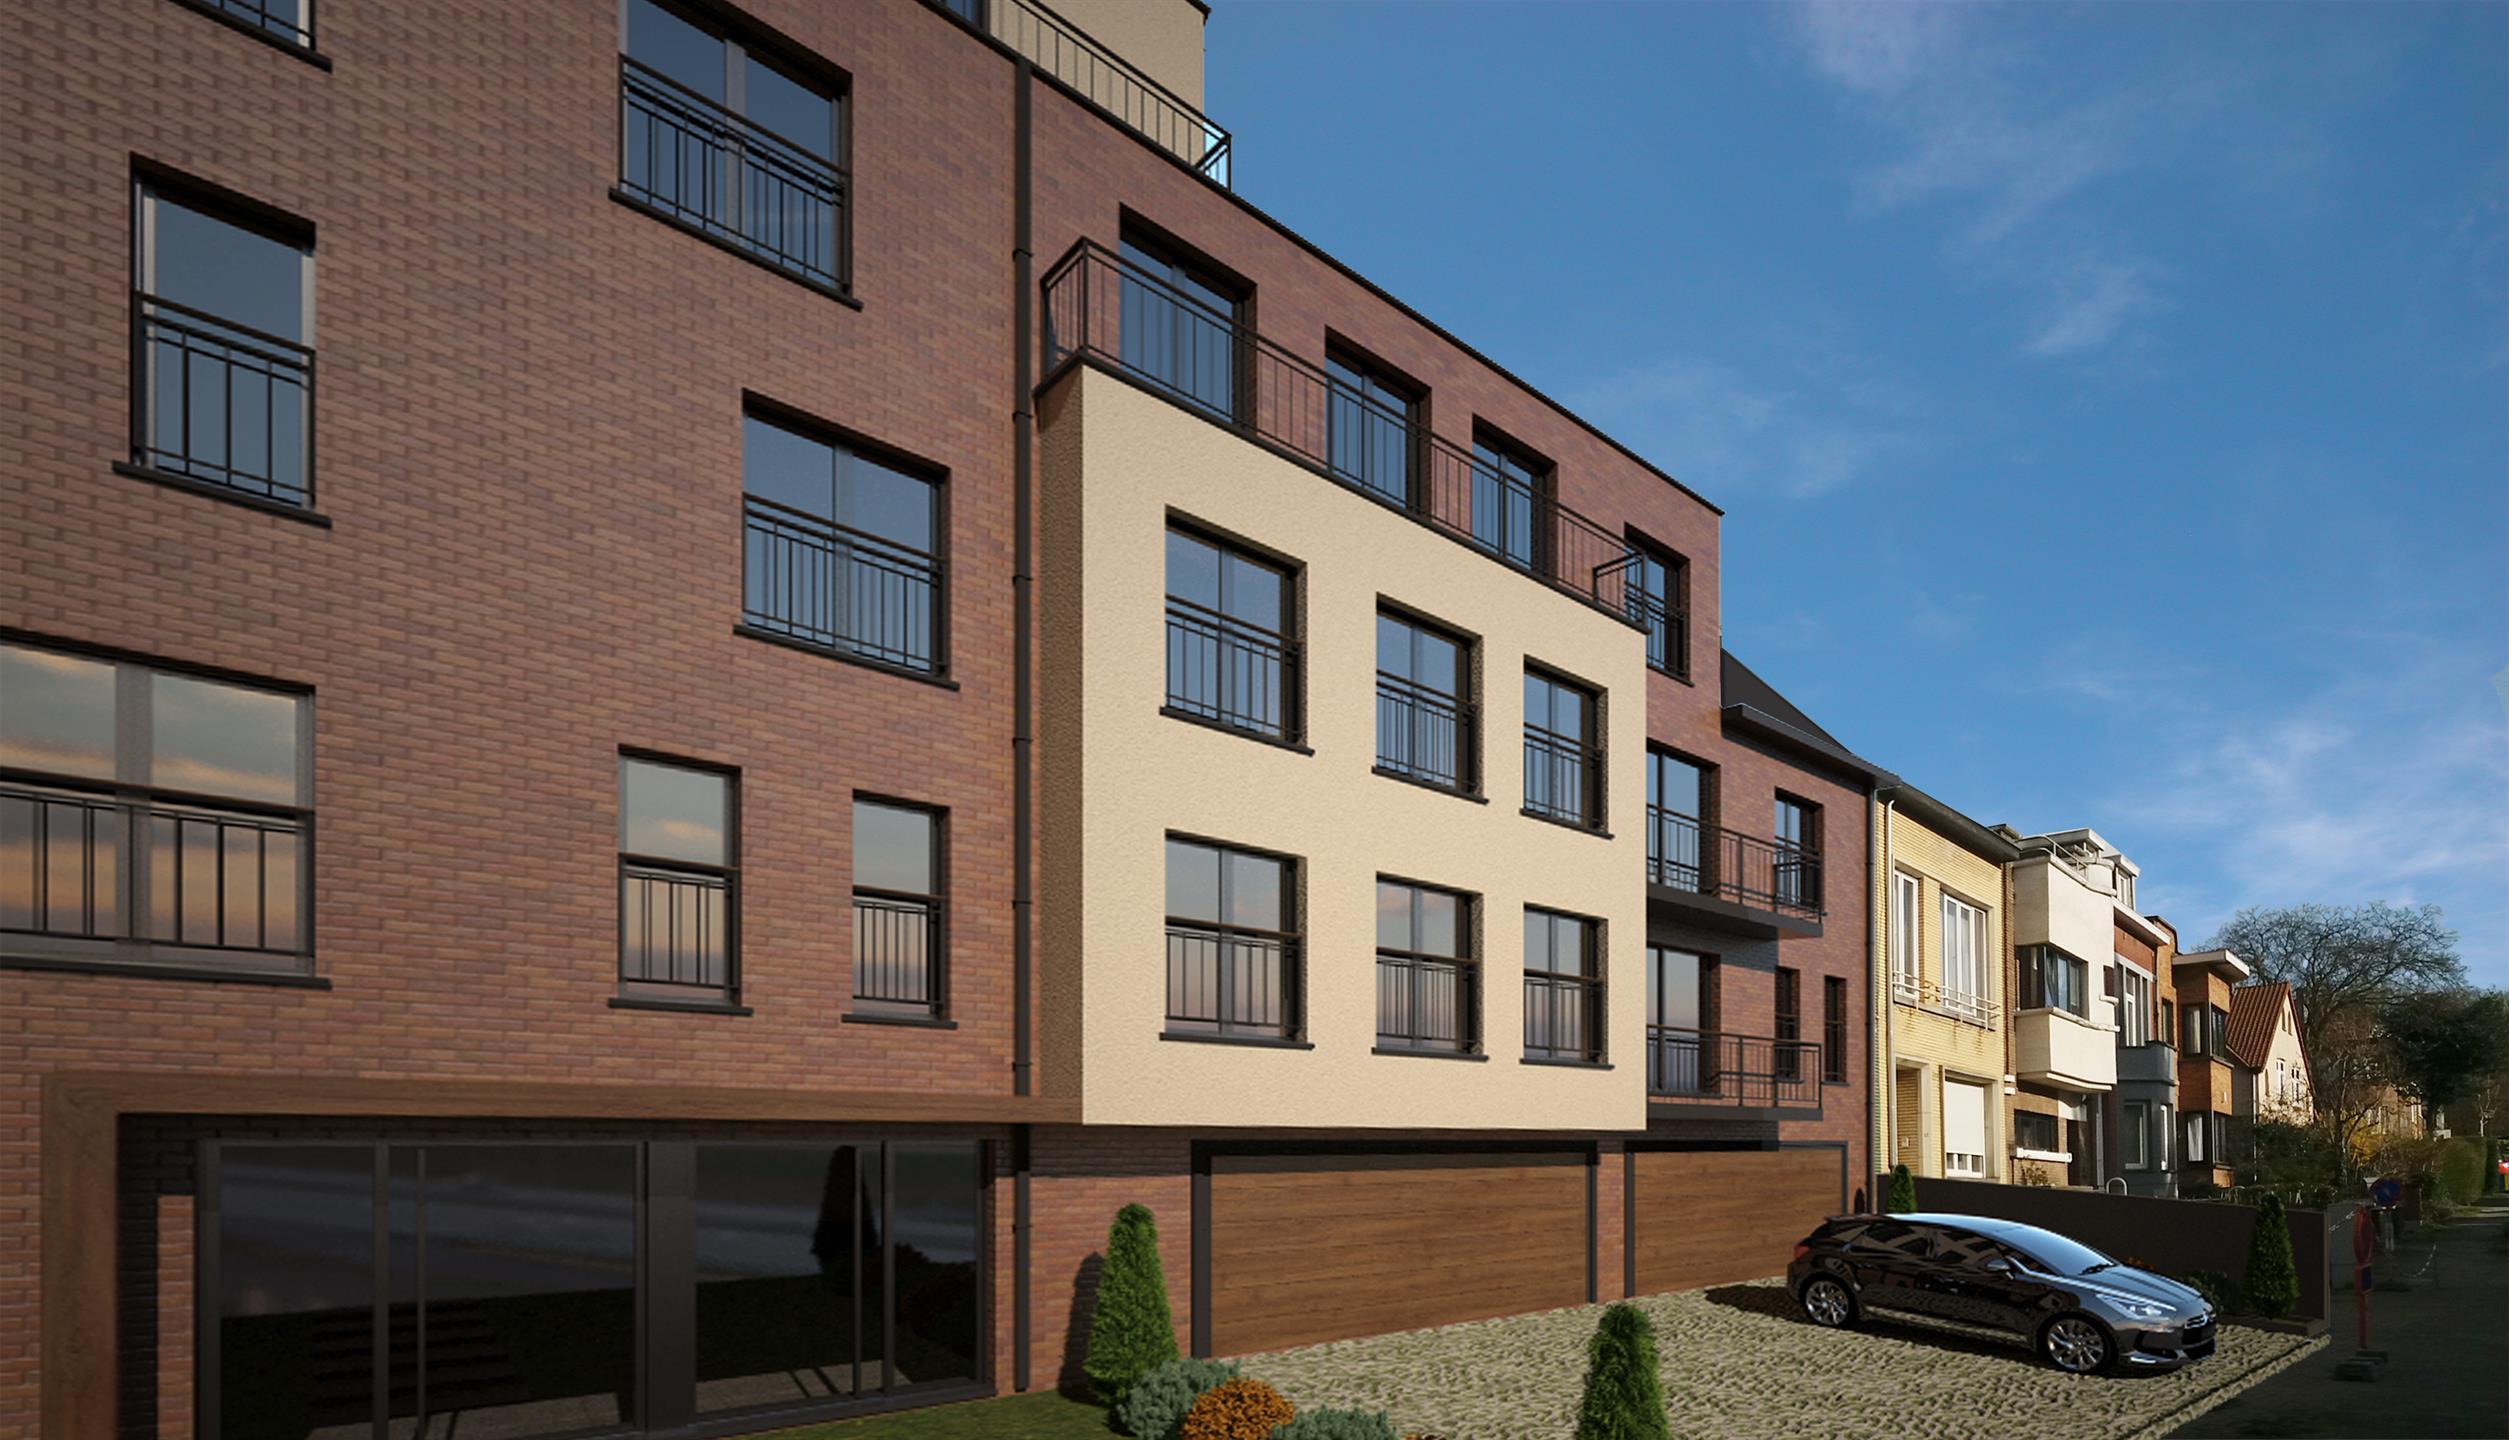 Appartement - Anderlecht - #4314114-1